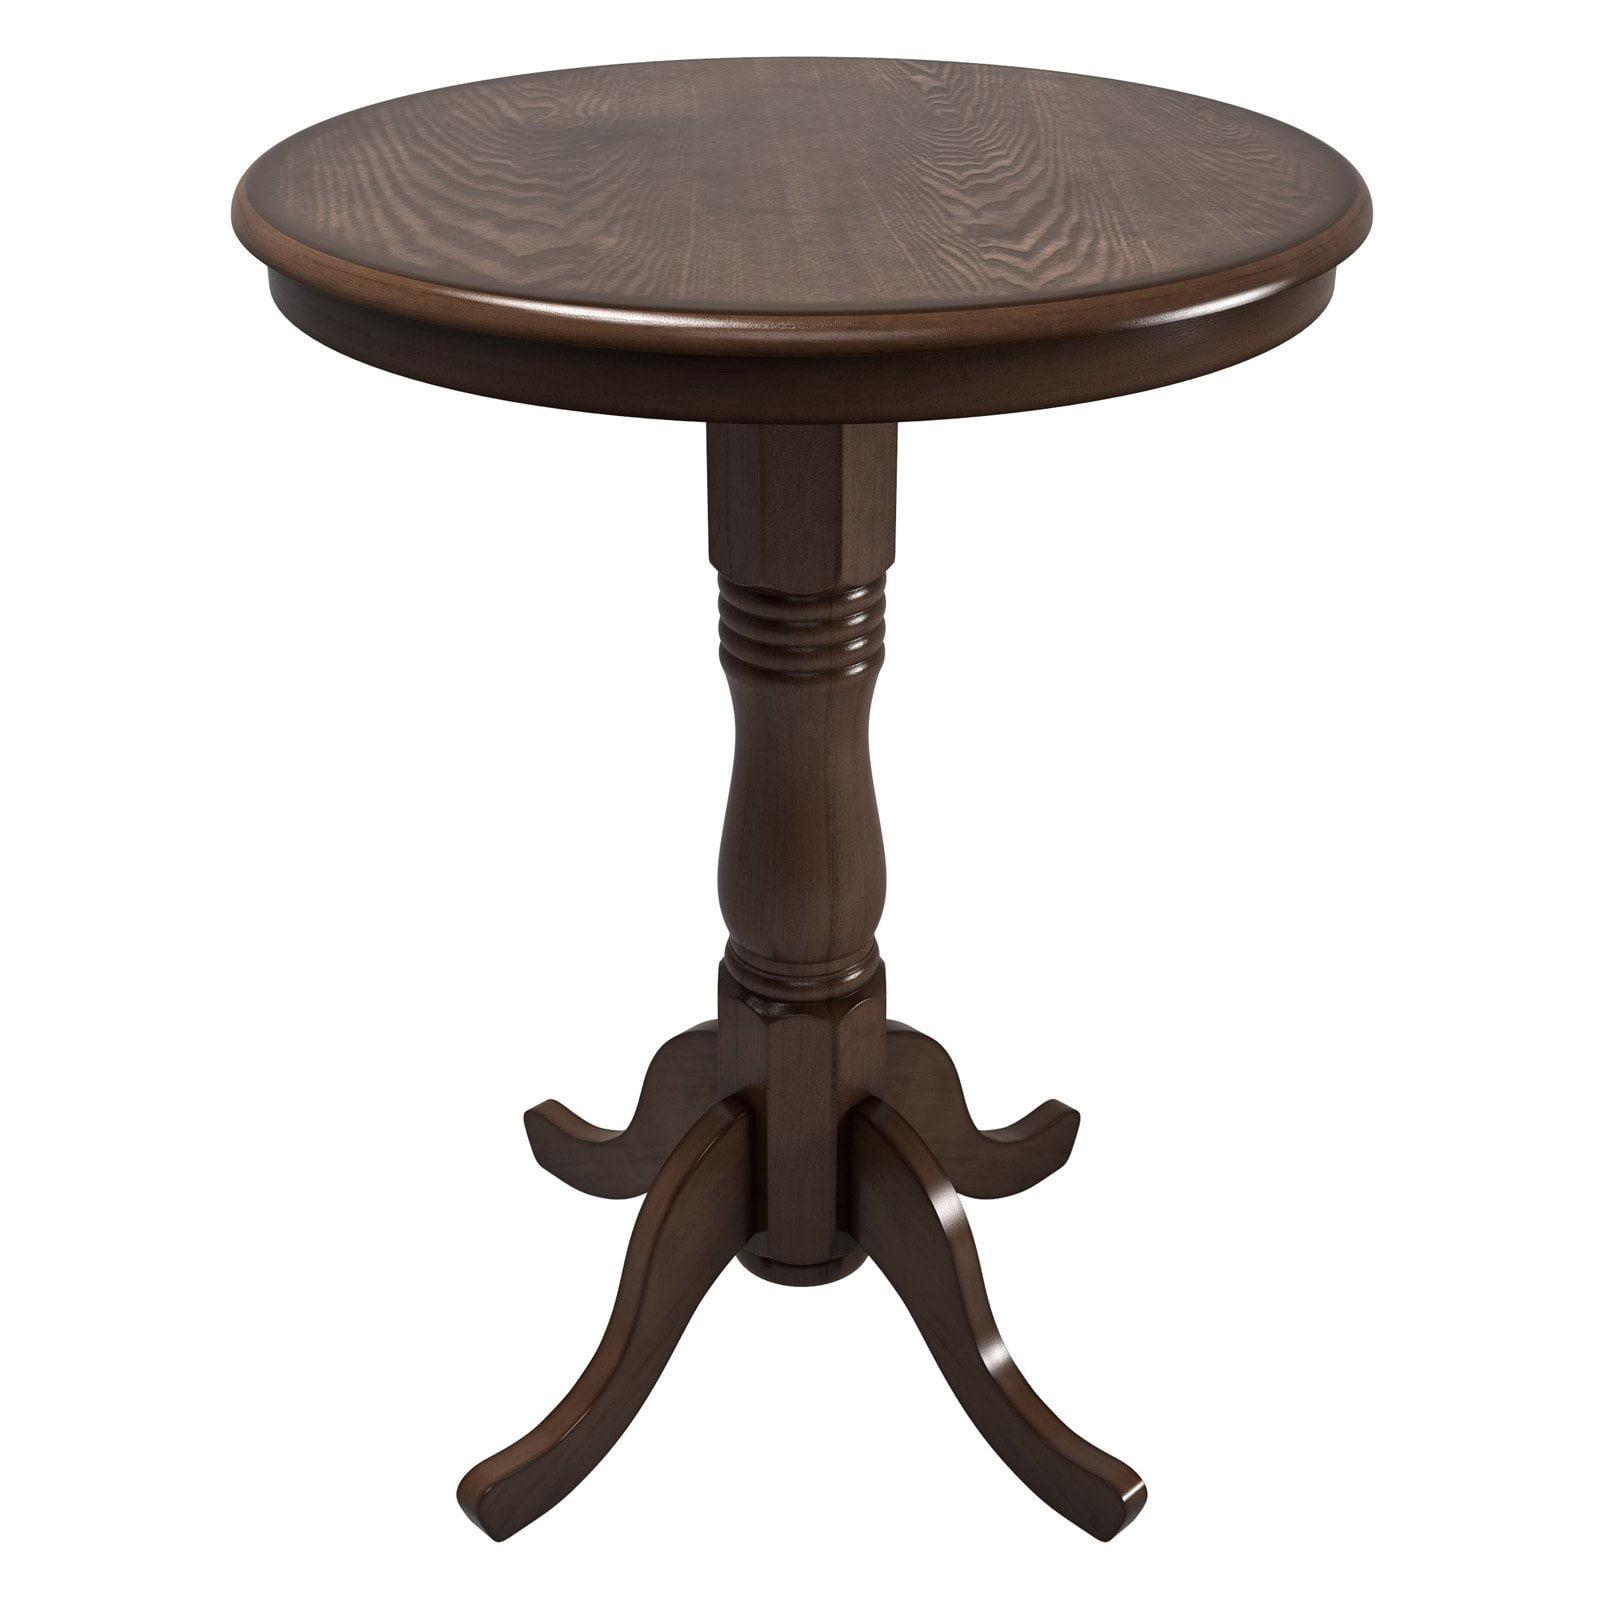 CorLiving Woodgrove Dark Brown Bar Table with Pedestal Base